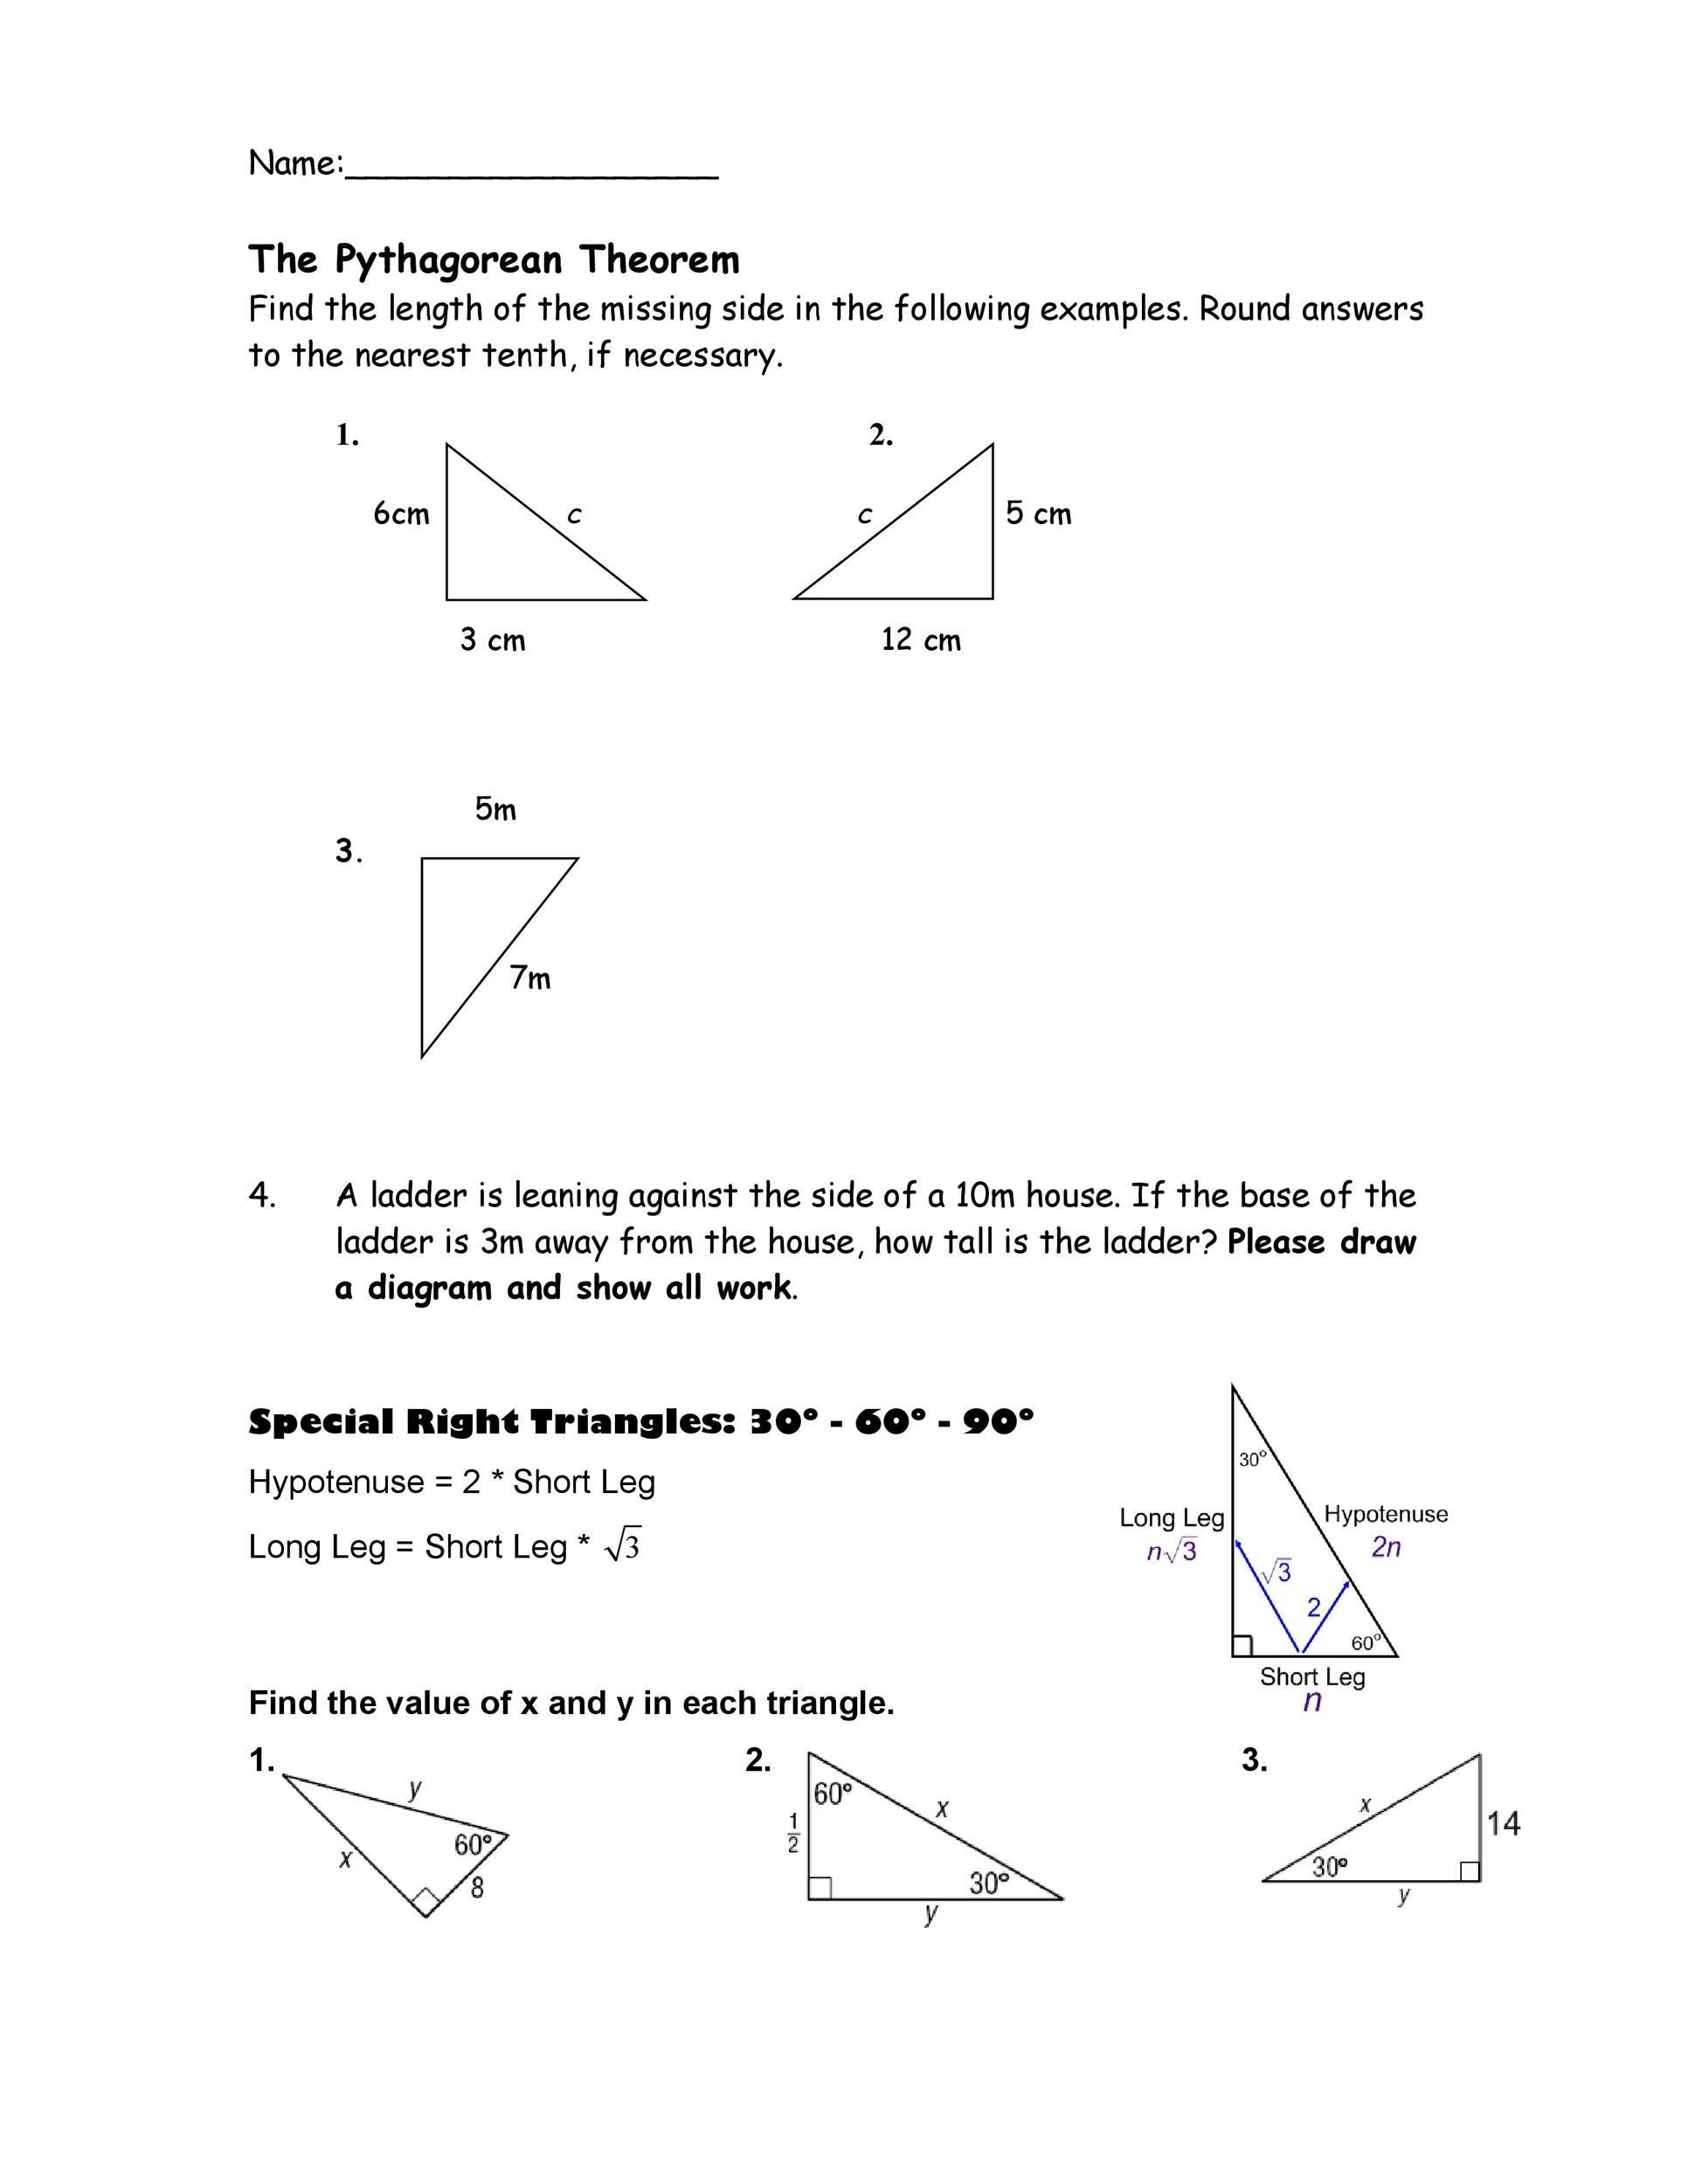 Free pythagorean theorem 20